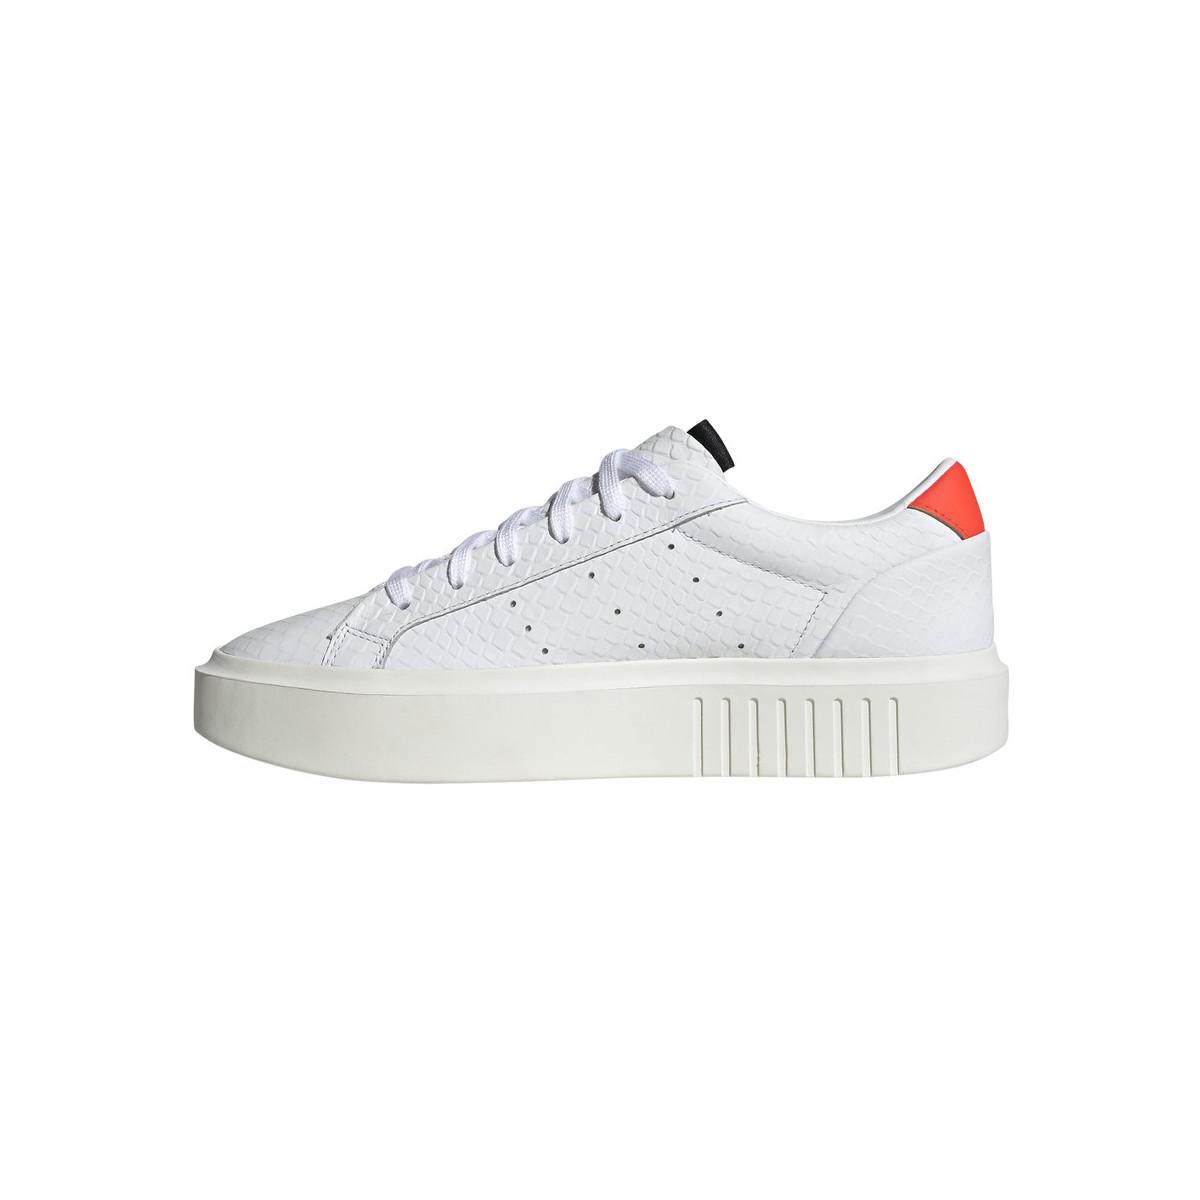 Basket adidas Originals SLEEK SUPER DownTownStock.Com